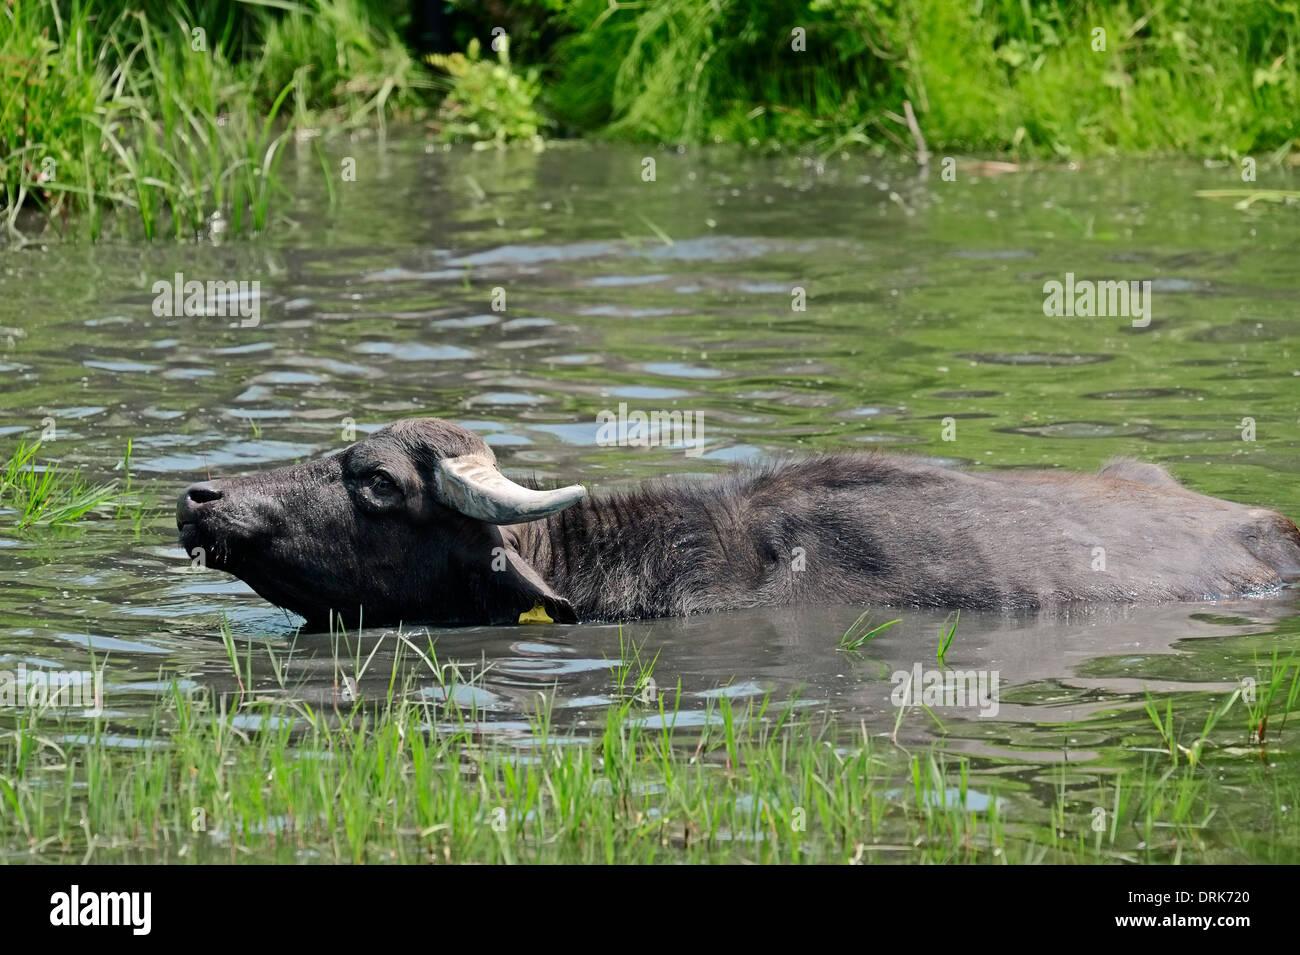 Asian Water Buffalo or Carabao (Bos arnee, Bubalus arnee) in waterhole, Greece, Europe - Stock Image